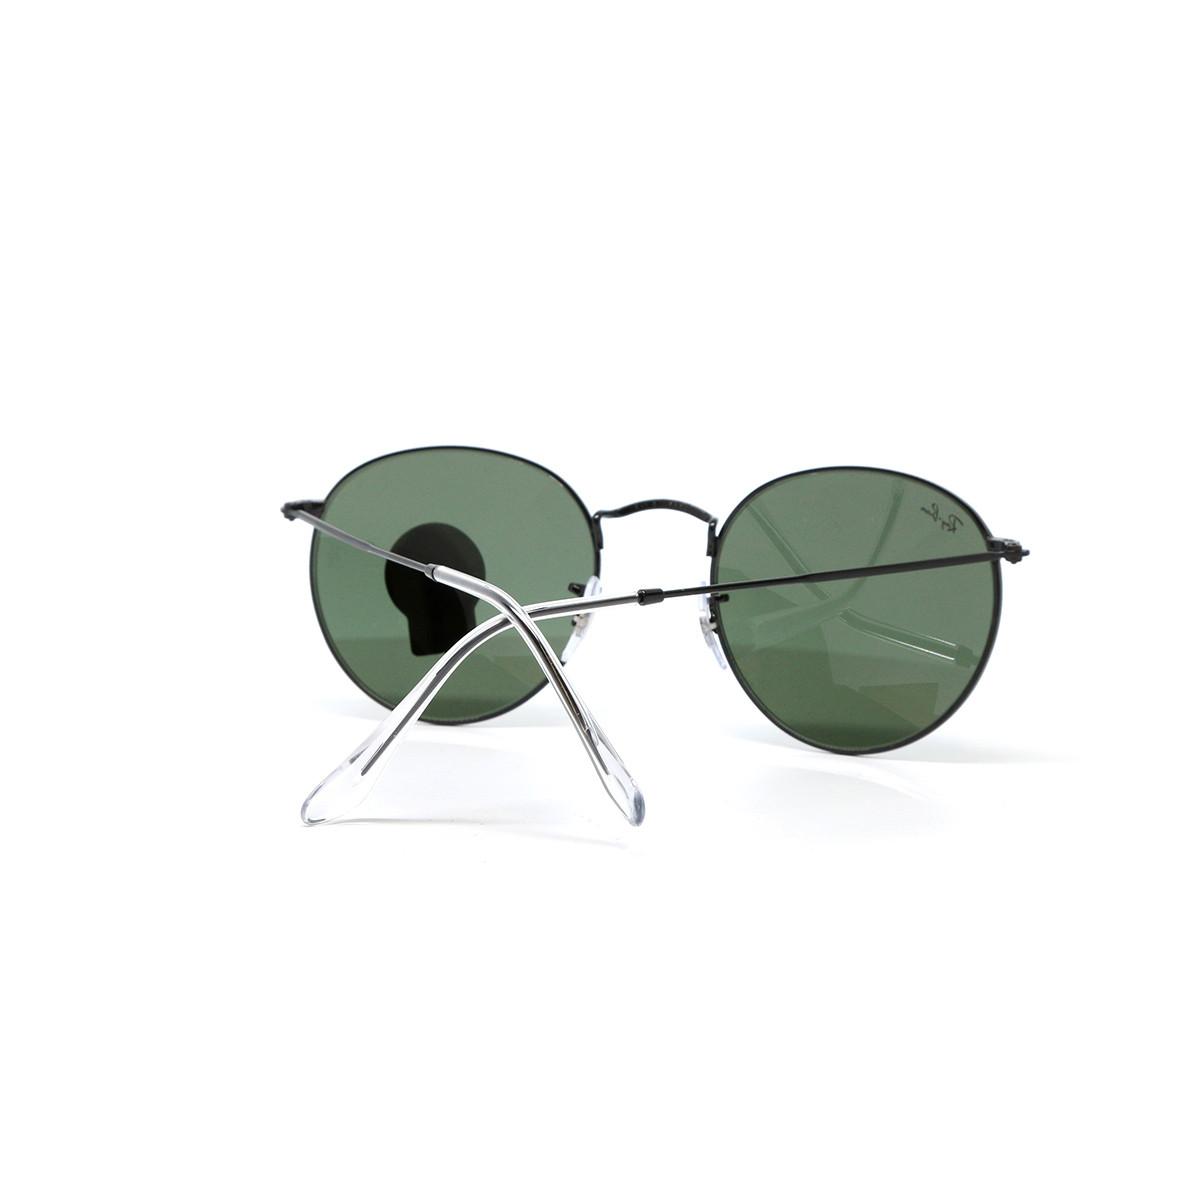 Солнцезащитные очки RB 3447 919931 53 Фото №3 - linza.com.ua